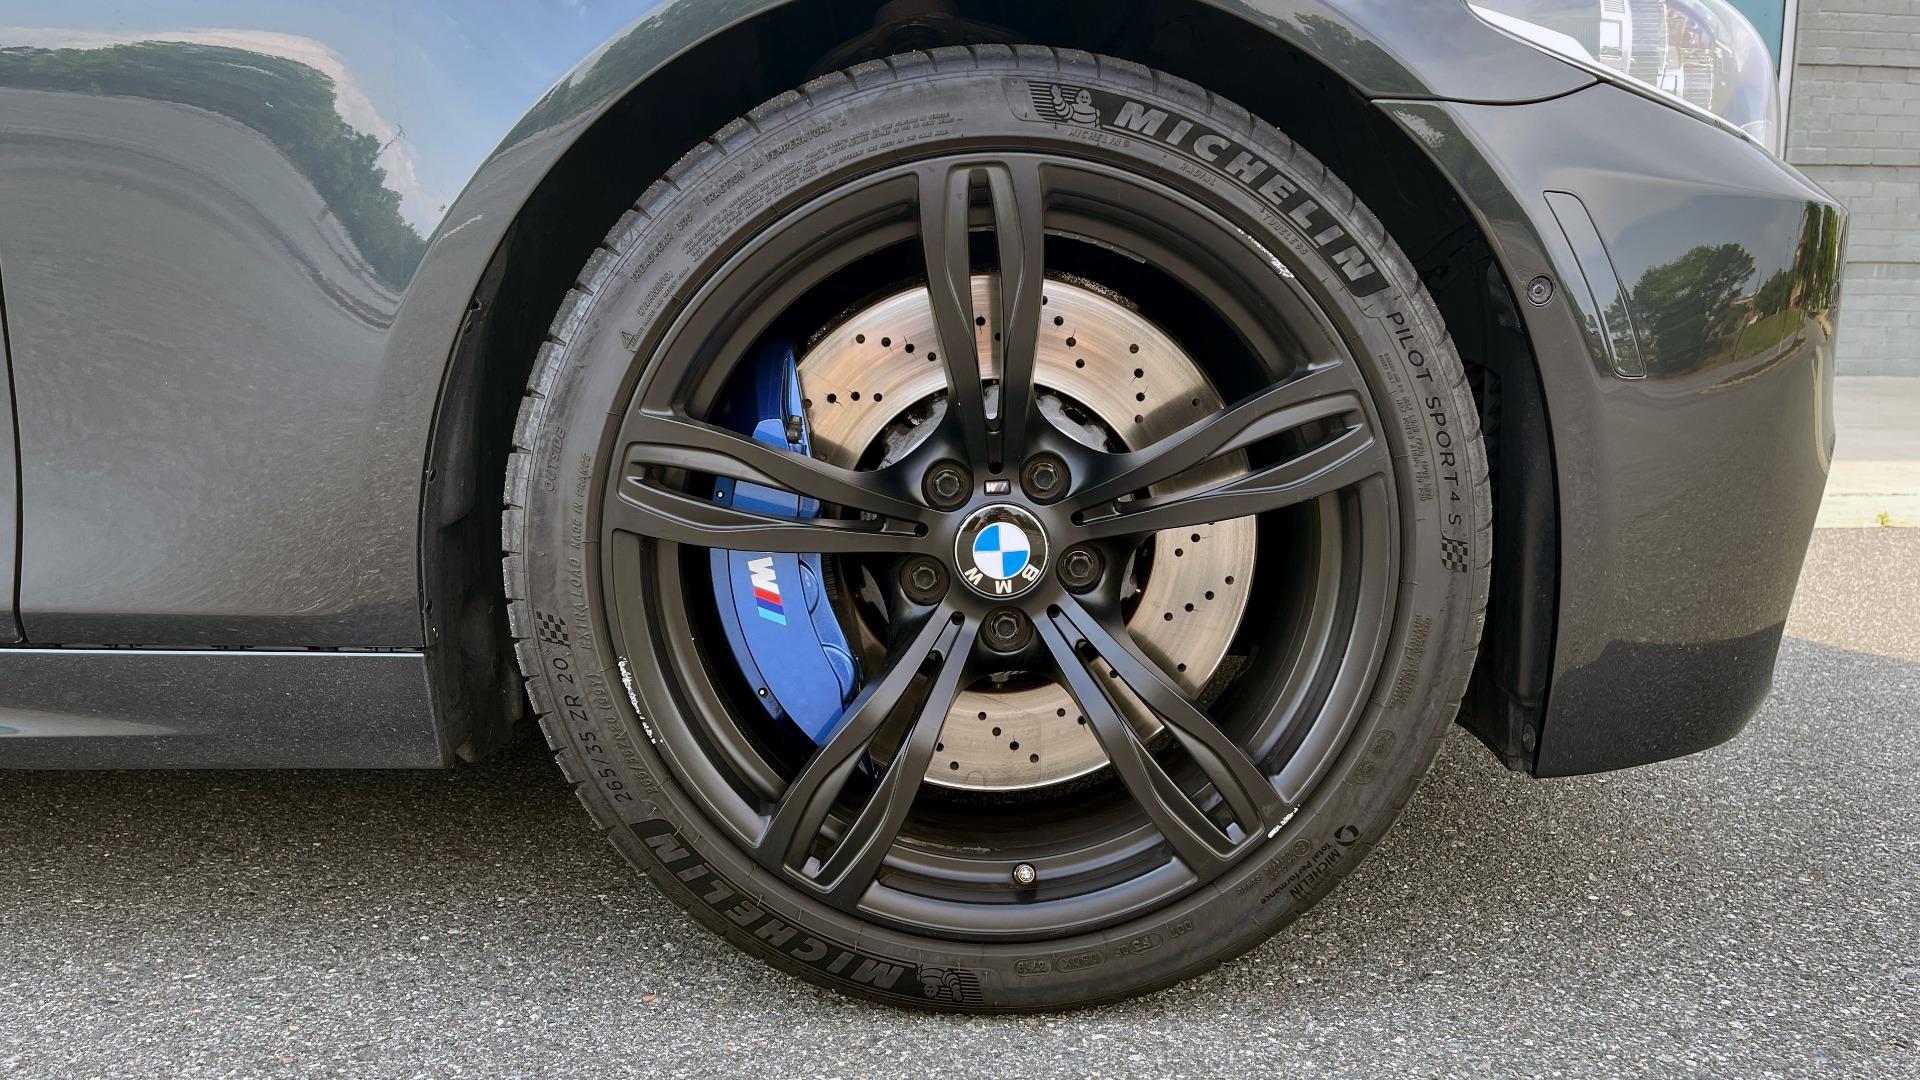 Used 2015 BMW M5 SEDAN / EXEC PKG / HUD / NAV / B&O SND / SUNROOF / REARVIEW for sale Sold at Formula Imports in Charlotte NC 28227 101